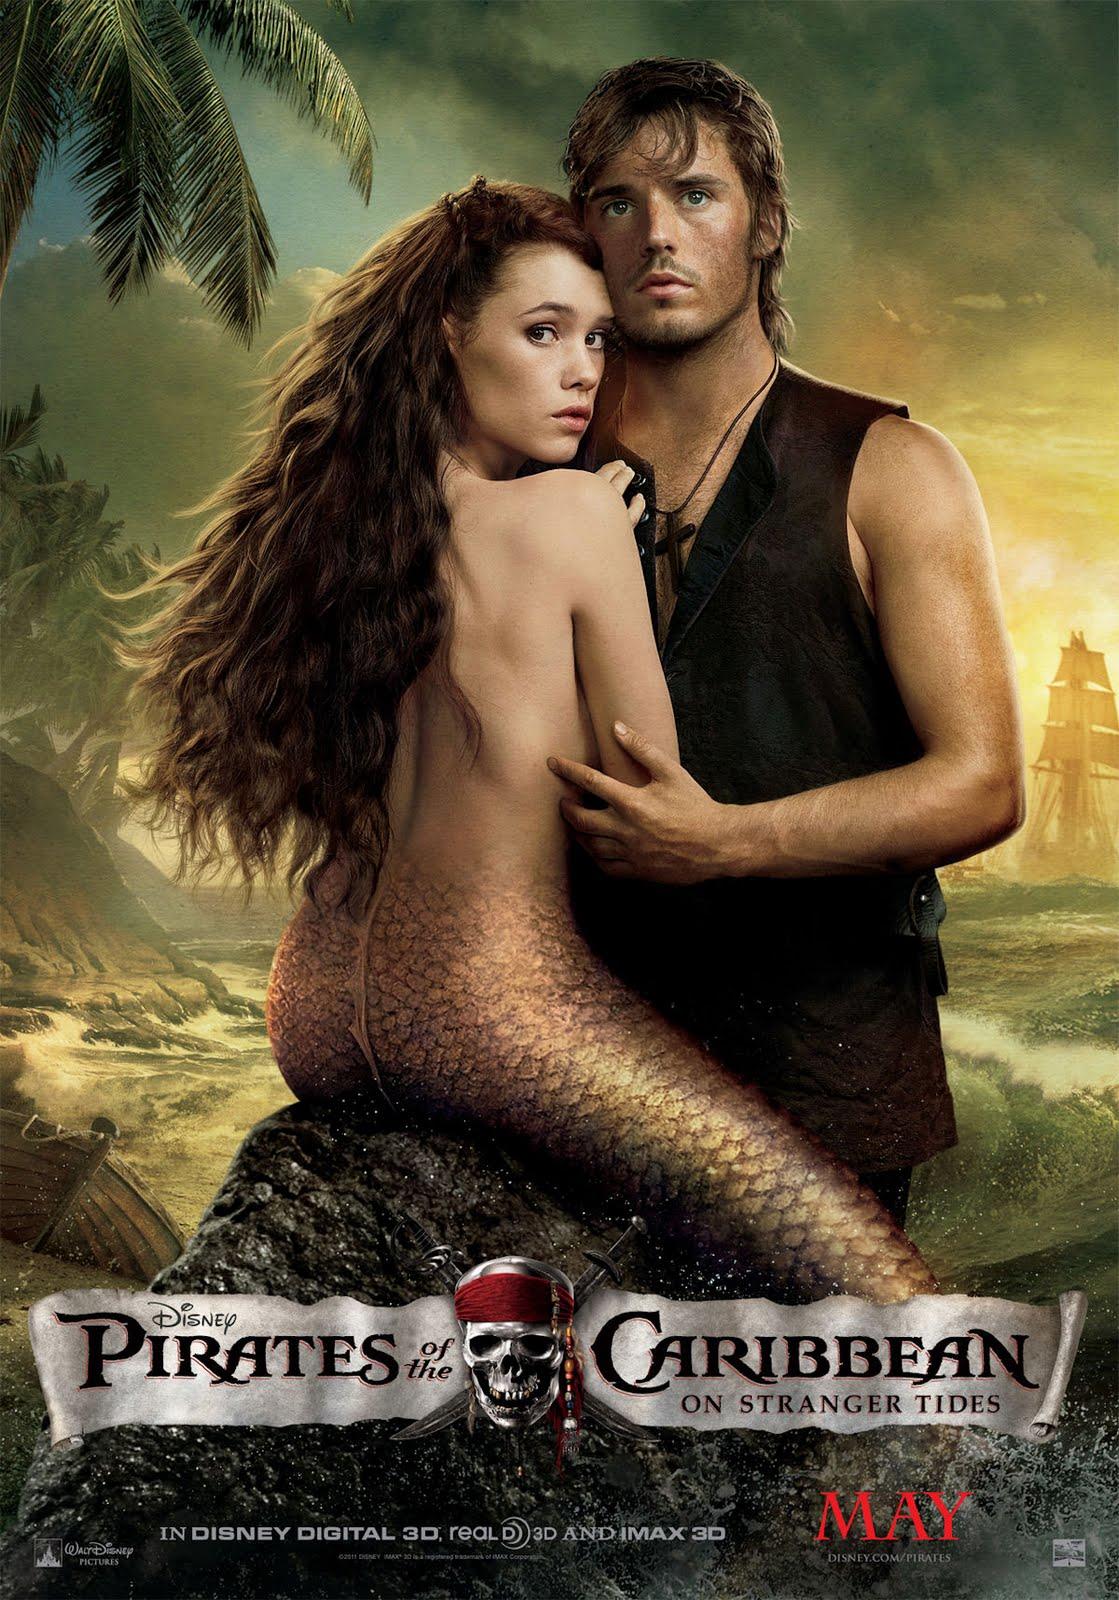 http://4.bp.blogspot.com/-u99lhXcvvNw/TbuAi4zDkWI/AAAAAAAAAKk/-2HAVYHy64U/s1600/Pirates-Mermaid-Poster-1.jpg